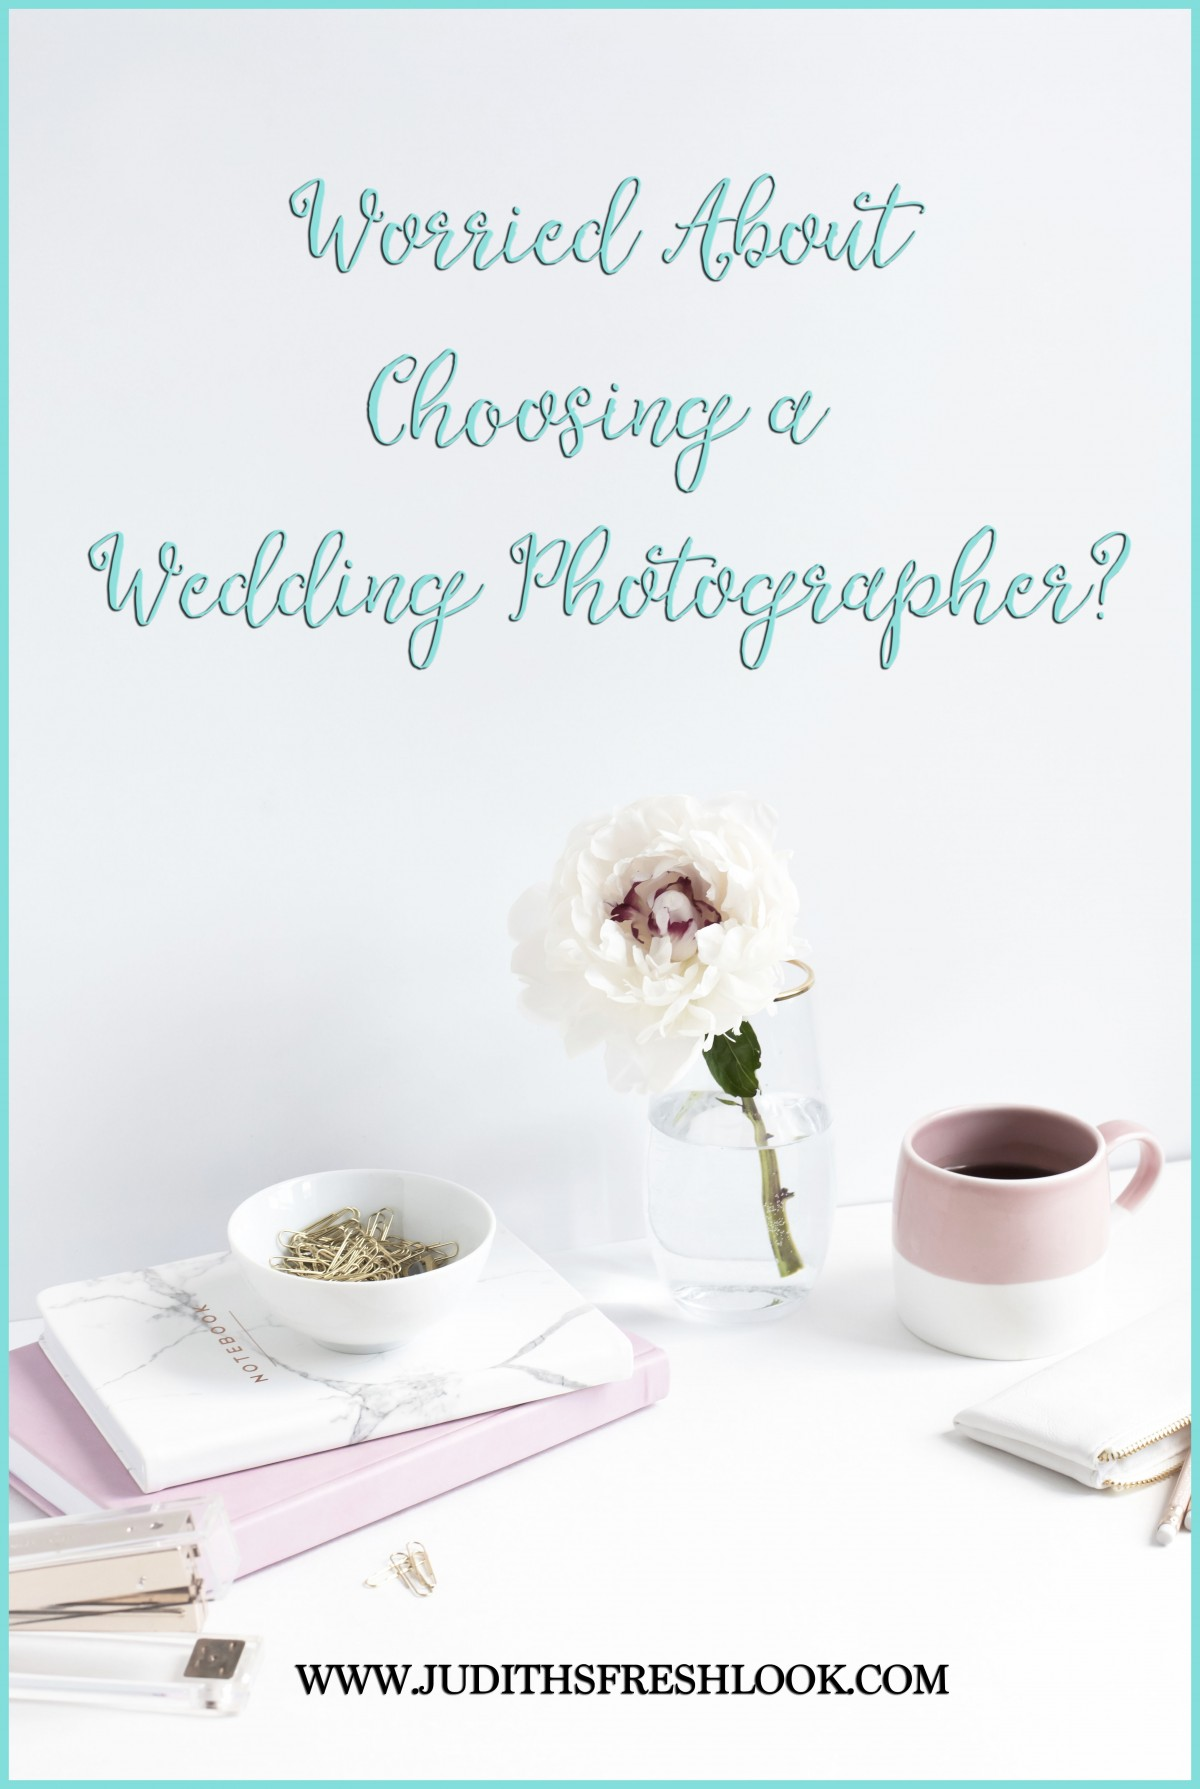 Choosing a Wedding Photographer – Worried Yet?